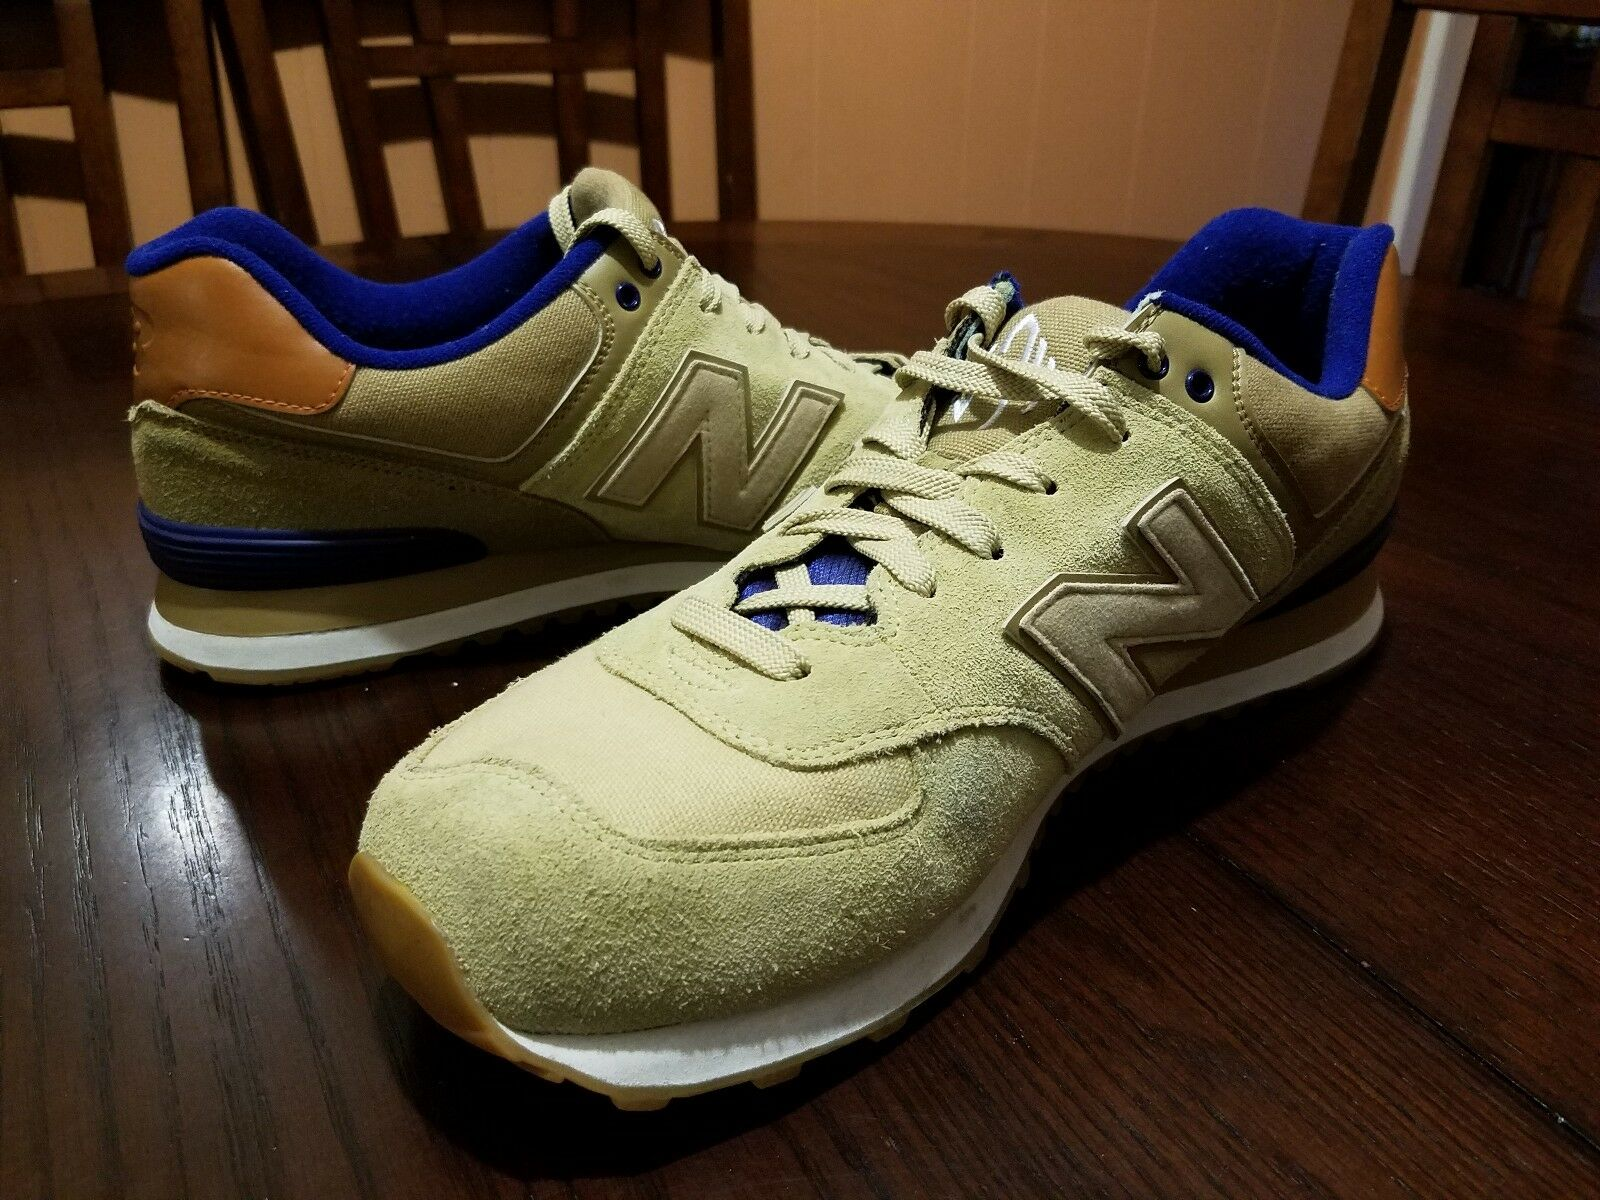 New balance männer beige, braun, blau, wildleder casual sportschuhe sportschuhe sportschuhe größe 13   ml574ned 6e3453